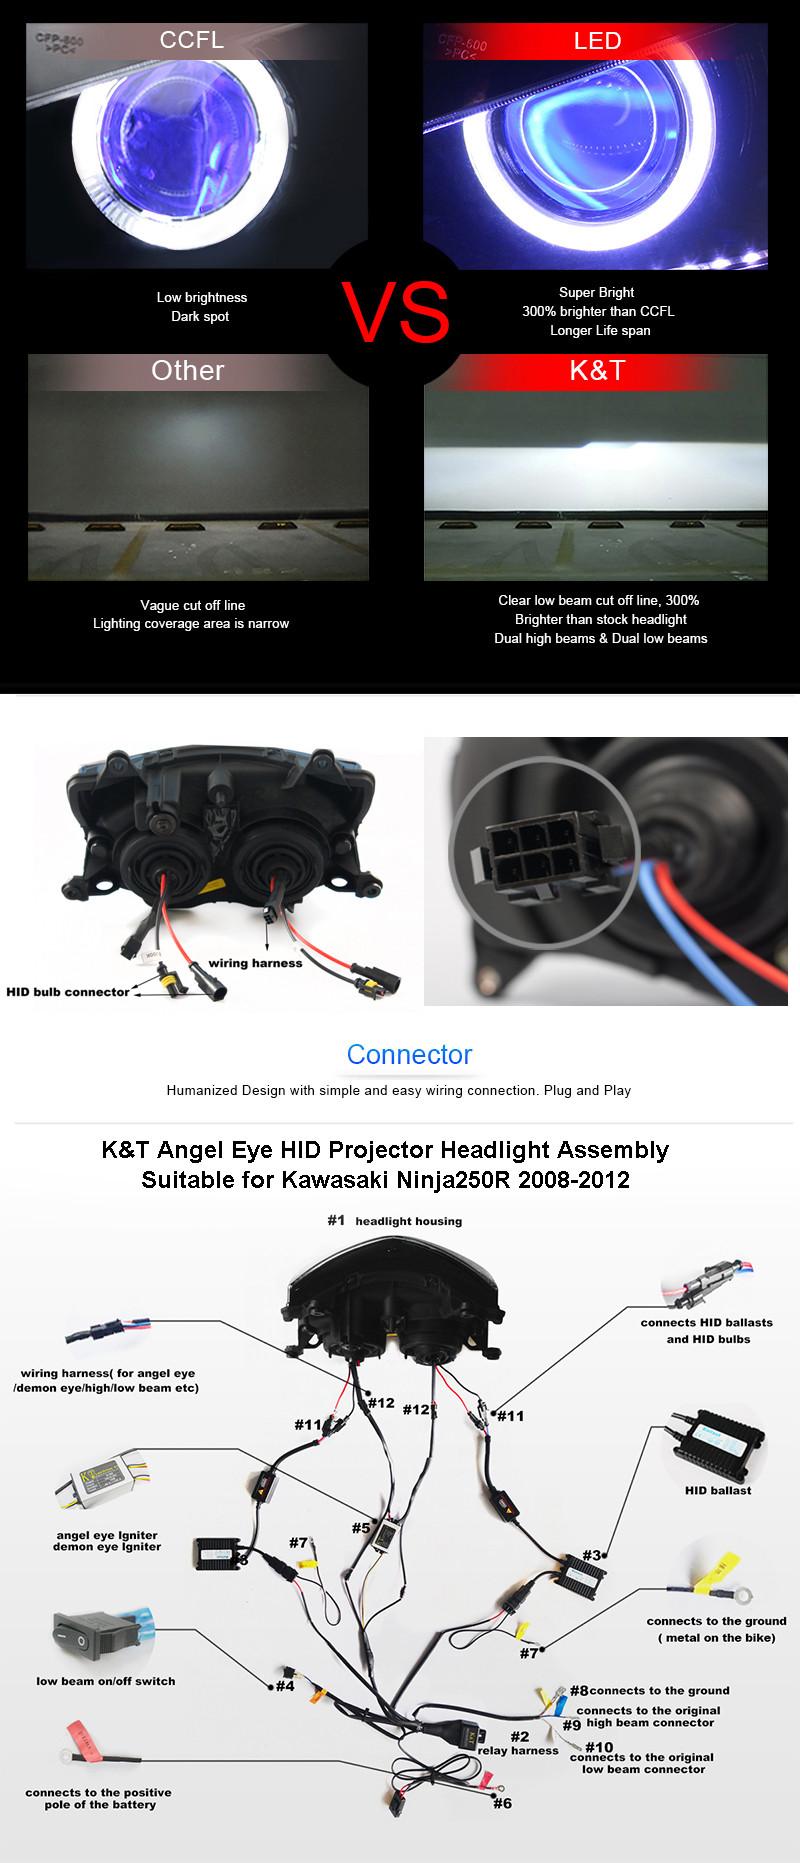 Kt Headlight For Kawasaki Ninja 250r 2008 2012 Led Angel Eye Green Wiring Harness Diagram Getsubject Aeproductgetsubject